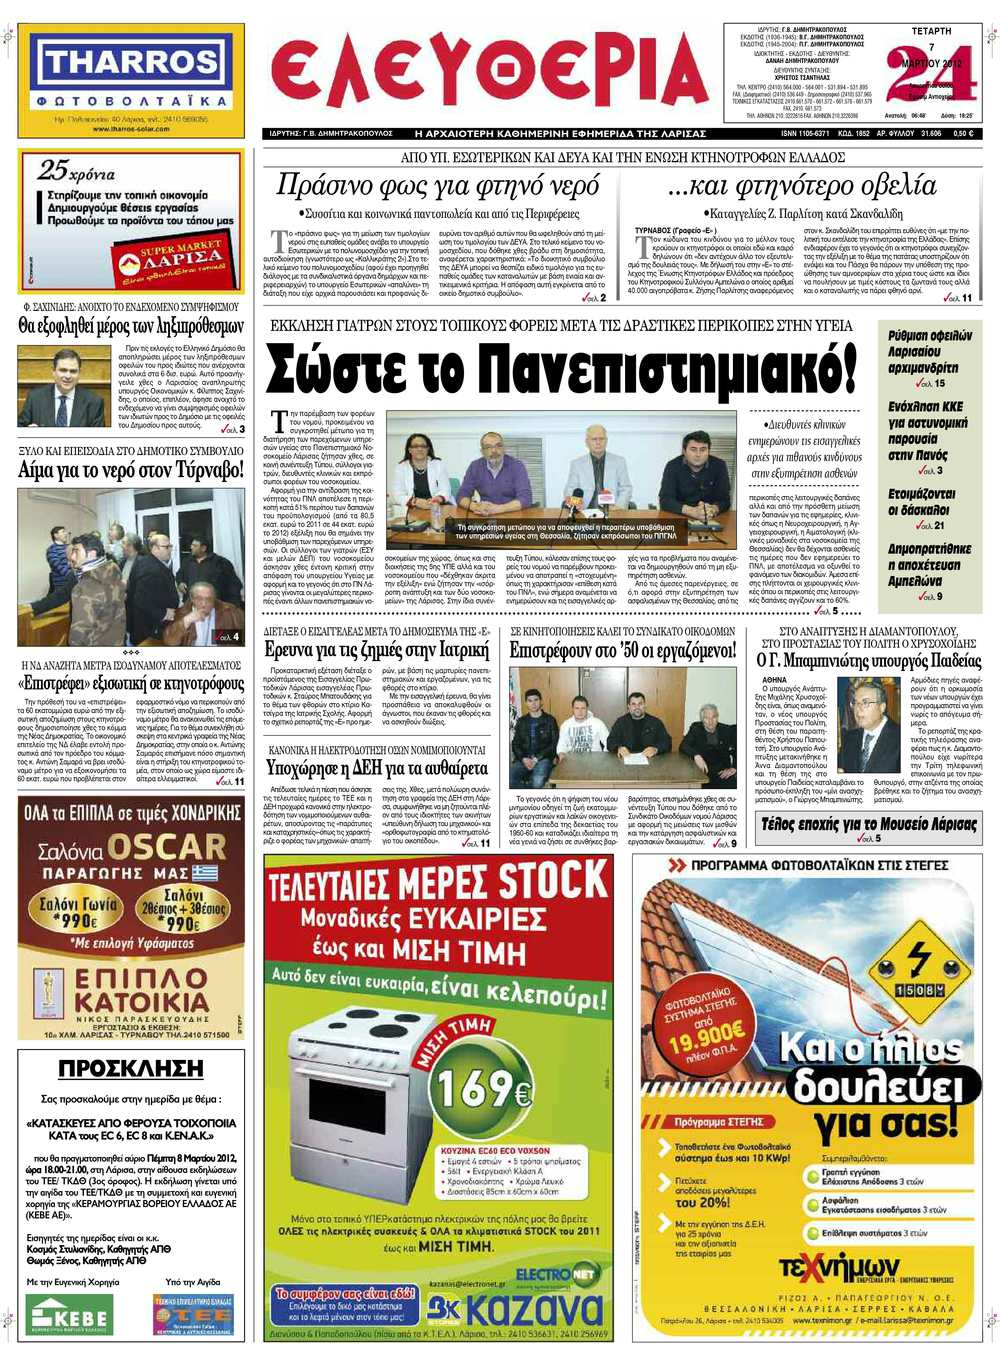 35f37116bc0 Calaméo - Eleftheria.gr_07/03/2012